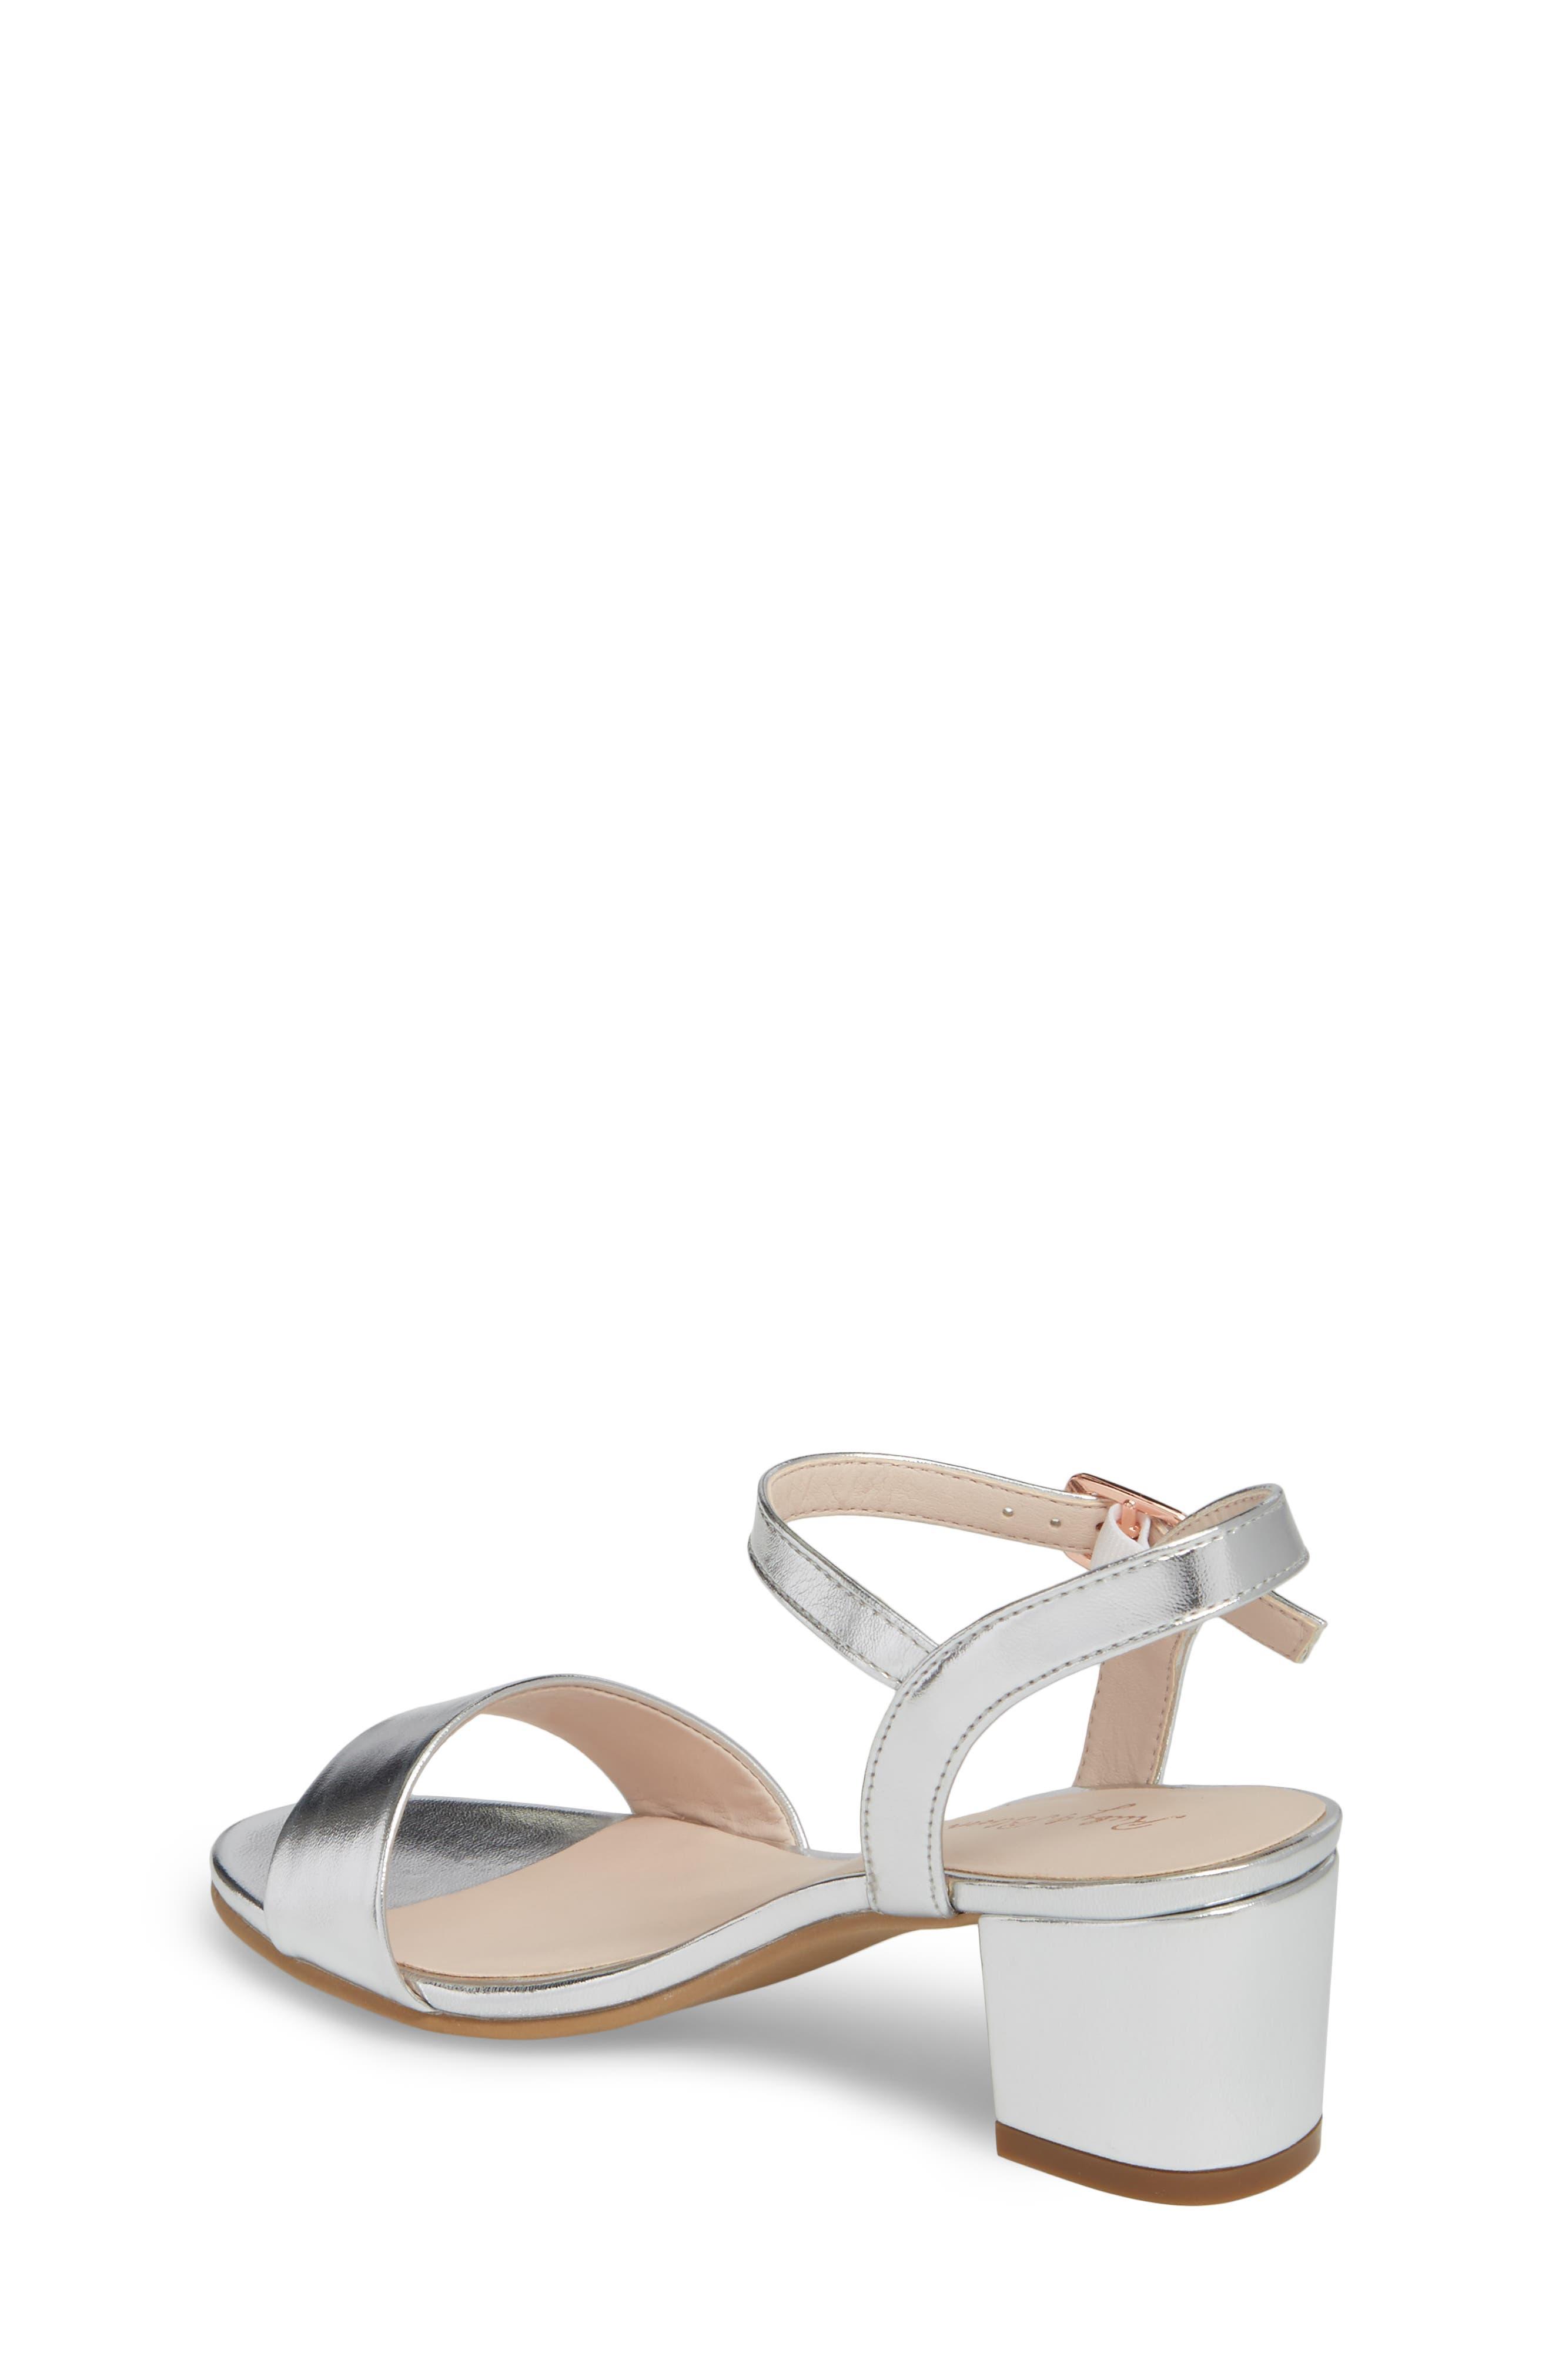 Danni Block Heel Sandal,                             Alternate thumbnail 2, color,                             Silver Faux Leather